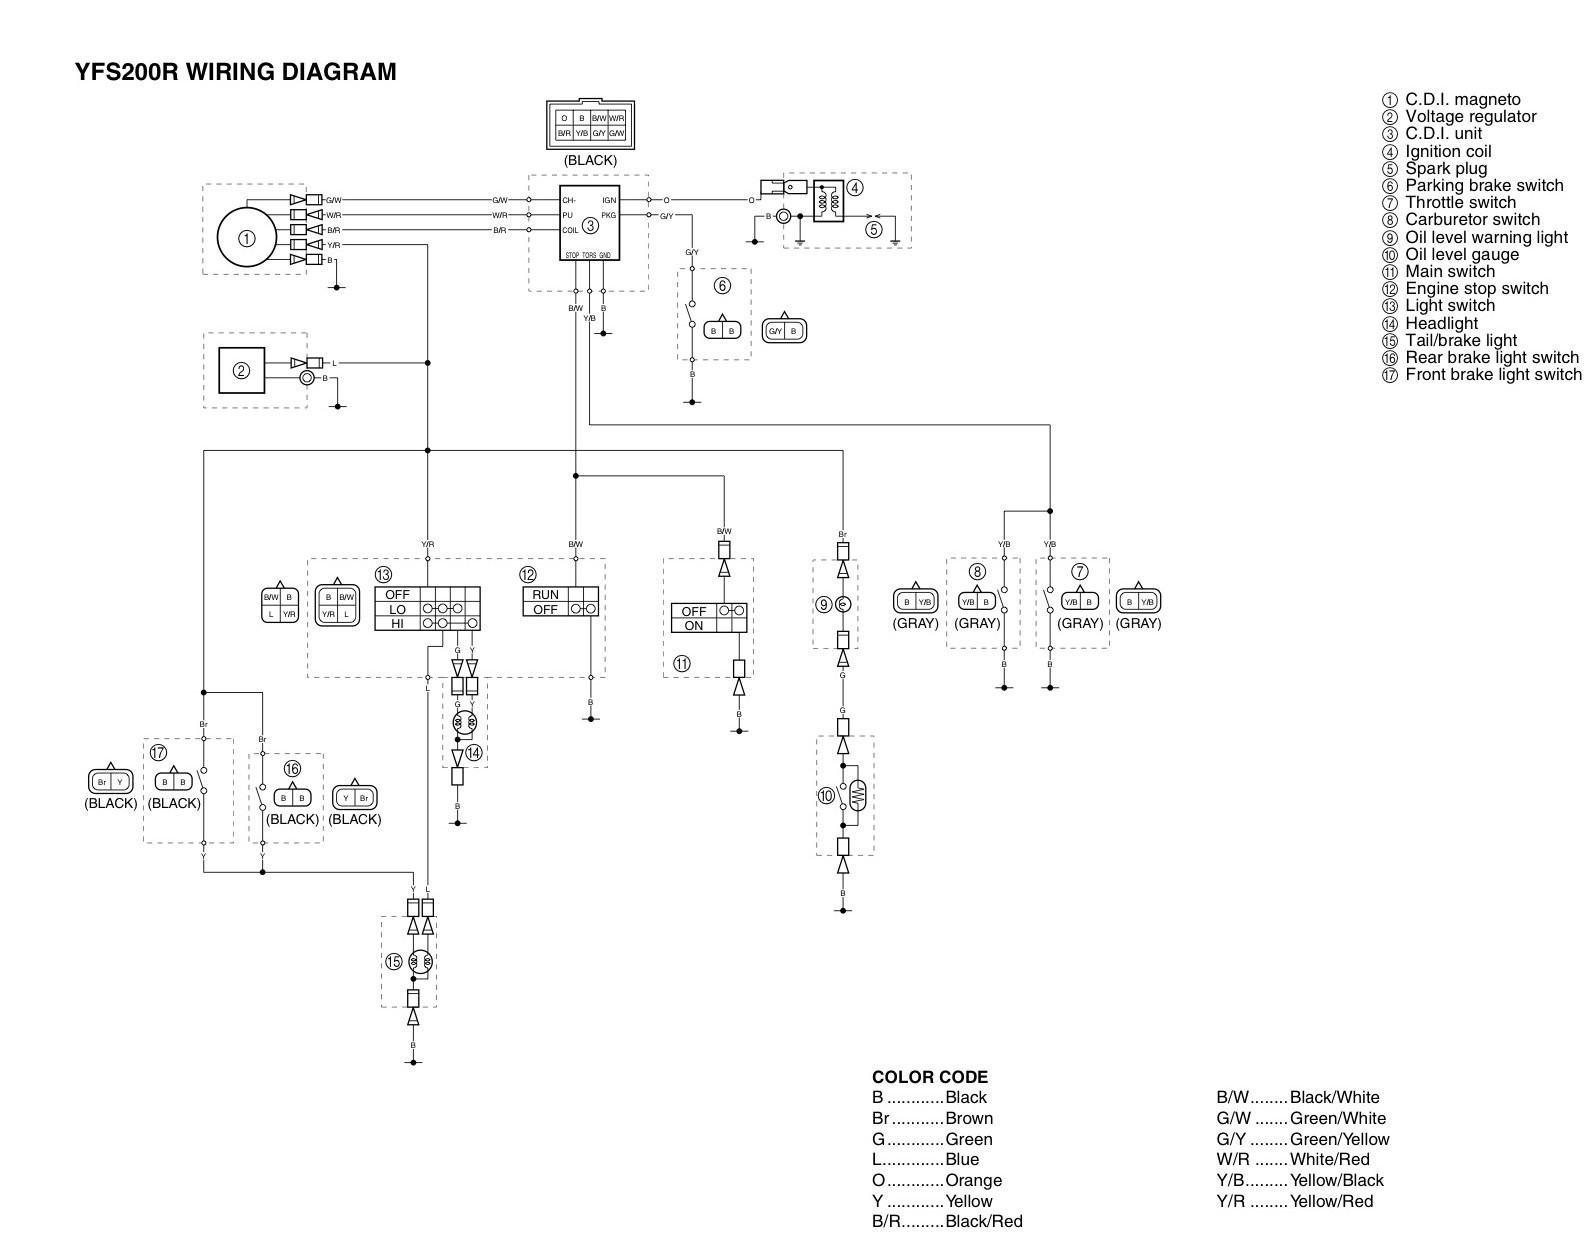 Pierce Fire Truck Wiring Diagram Wiring Diagram Wiringam for Yamaha Blaster Fresh Best Stator Of Pierce Fire Truck Wiring Diagram